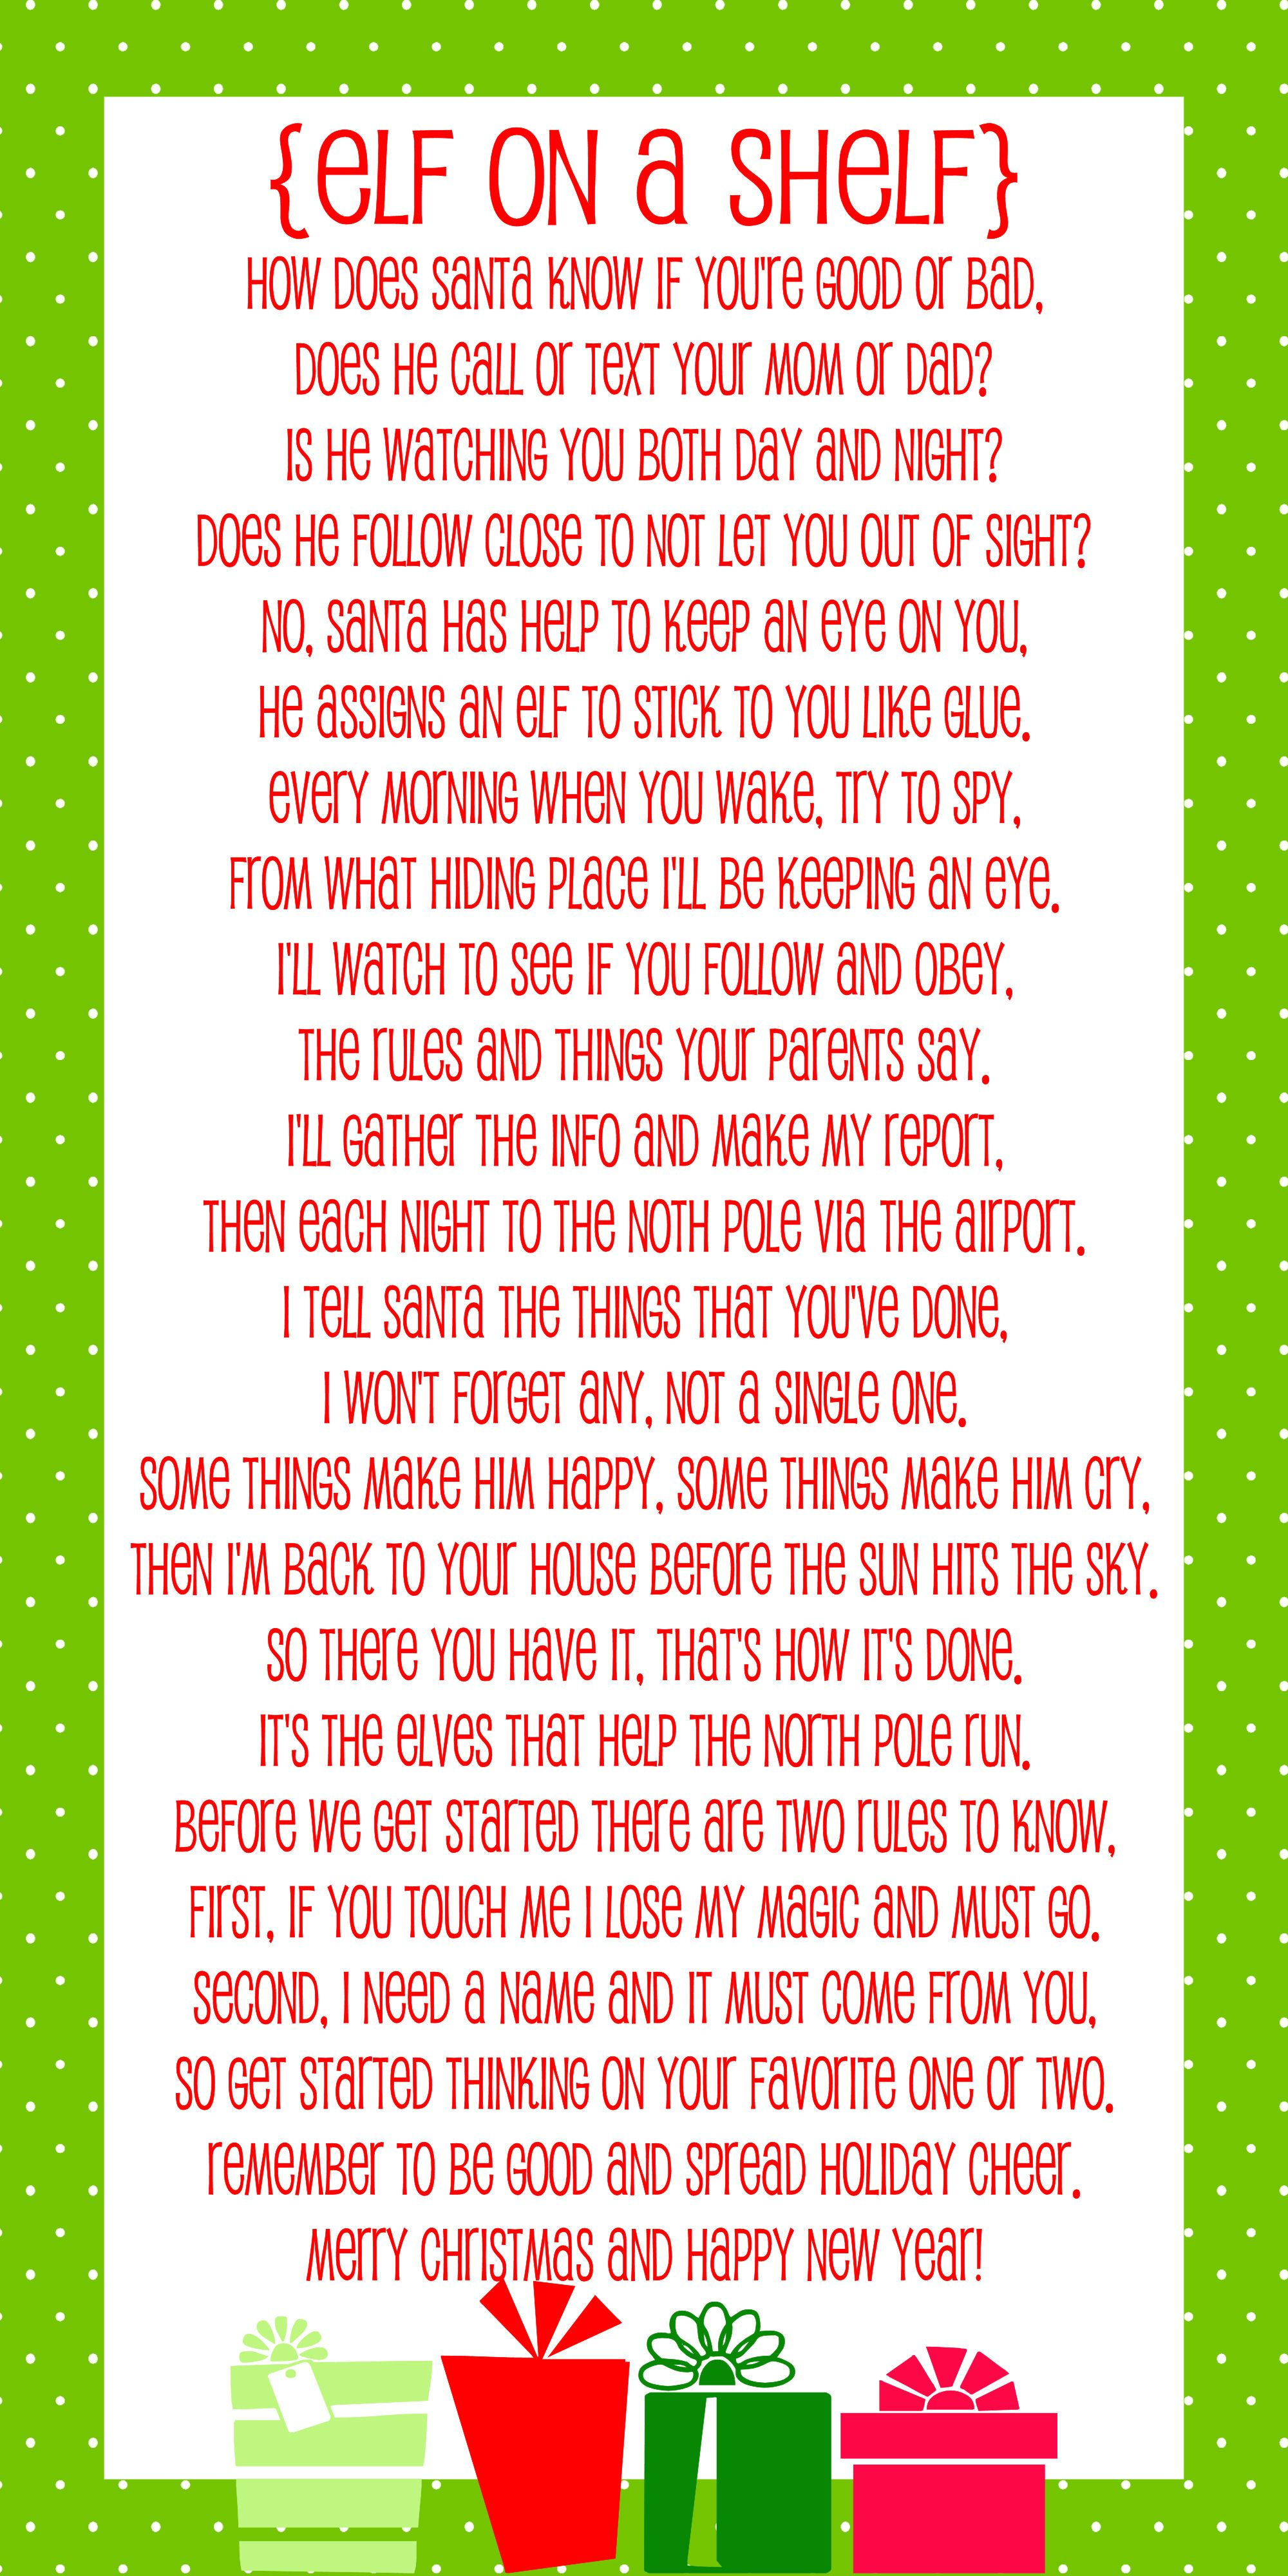 Elf On The Shelf Story - Free Printable Poem | Christmas | Elf On - Free Printable Elf On The Shelf Story